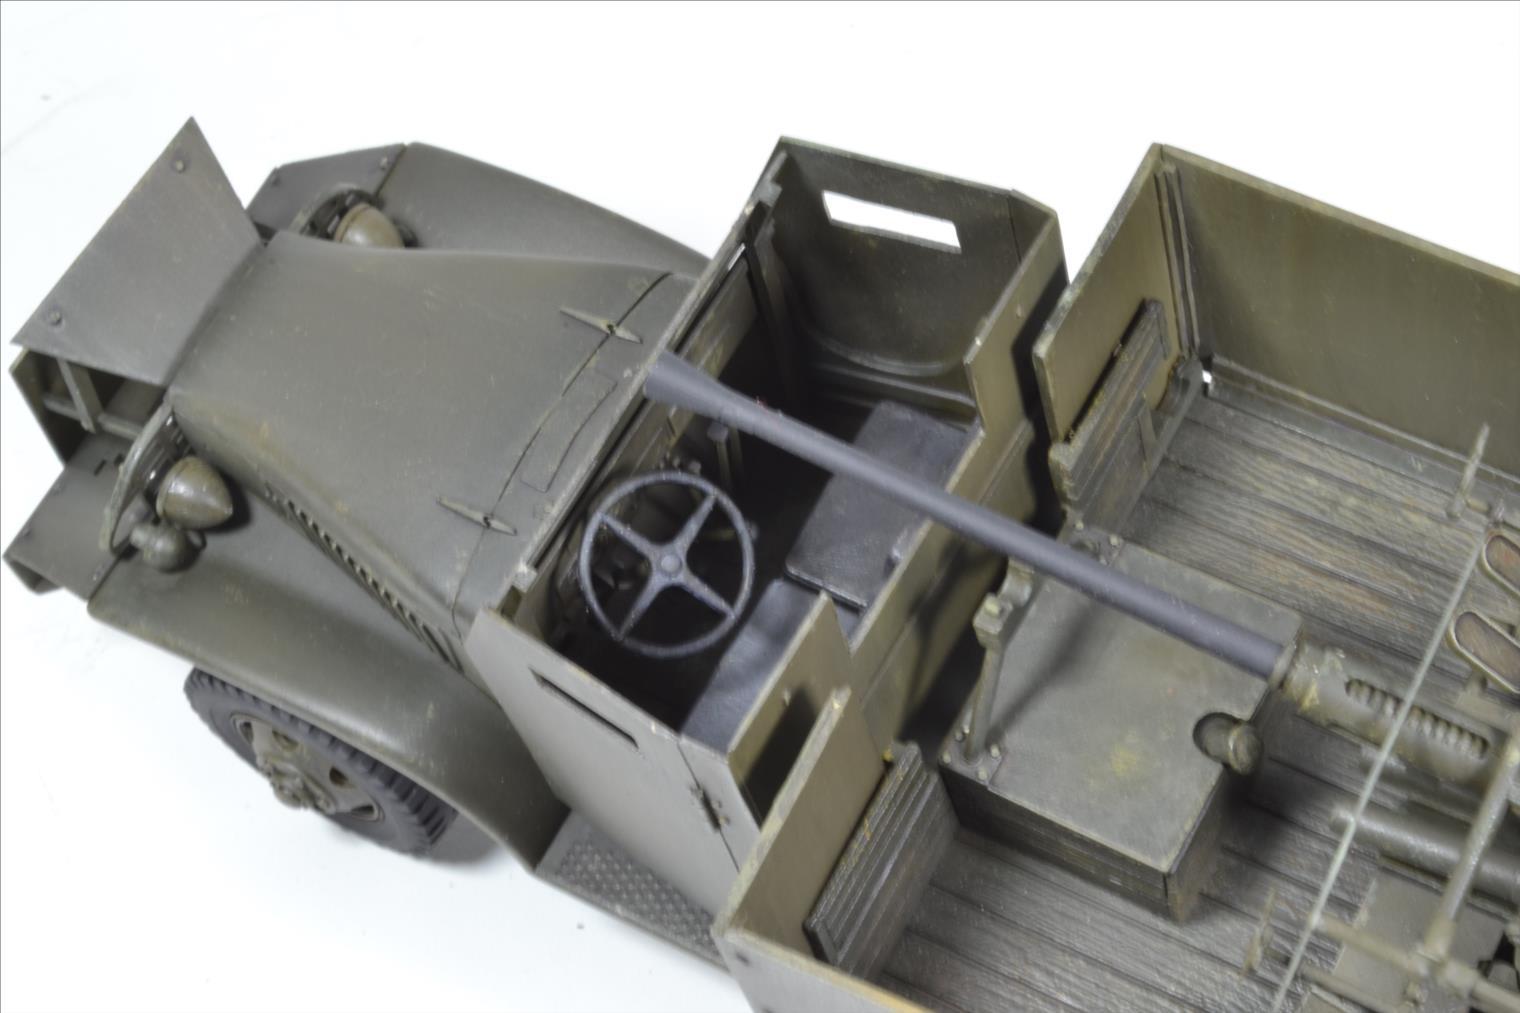 INDOCHINE GMC Bofors (Hobby Boss) 1/35 - Page 2 19122109485022494216568061